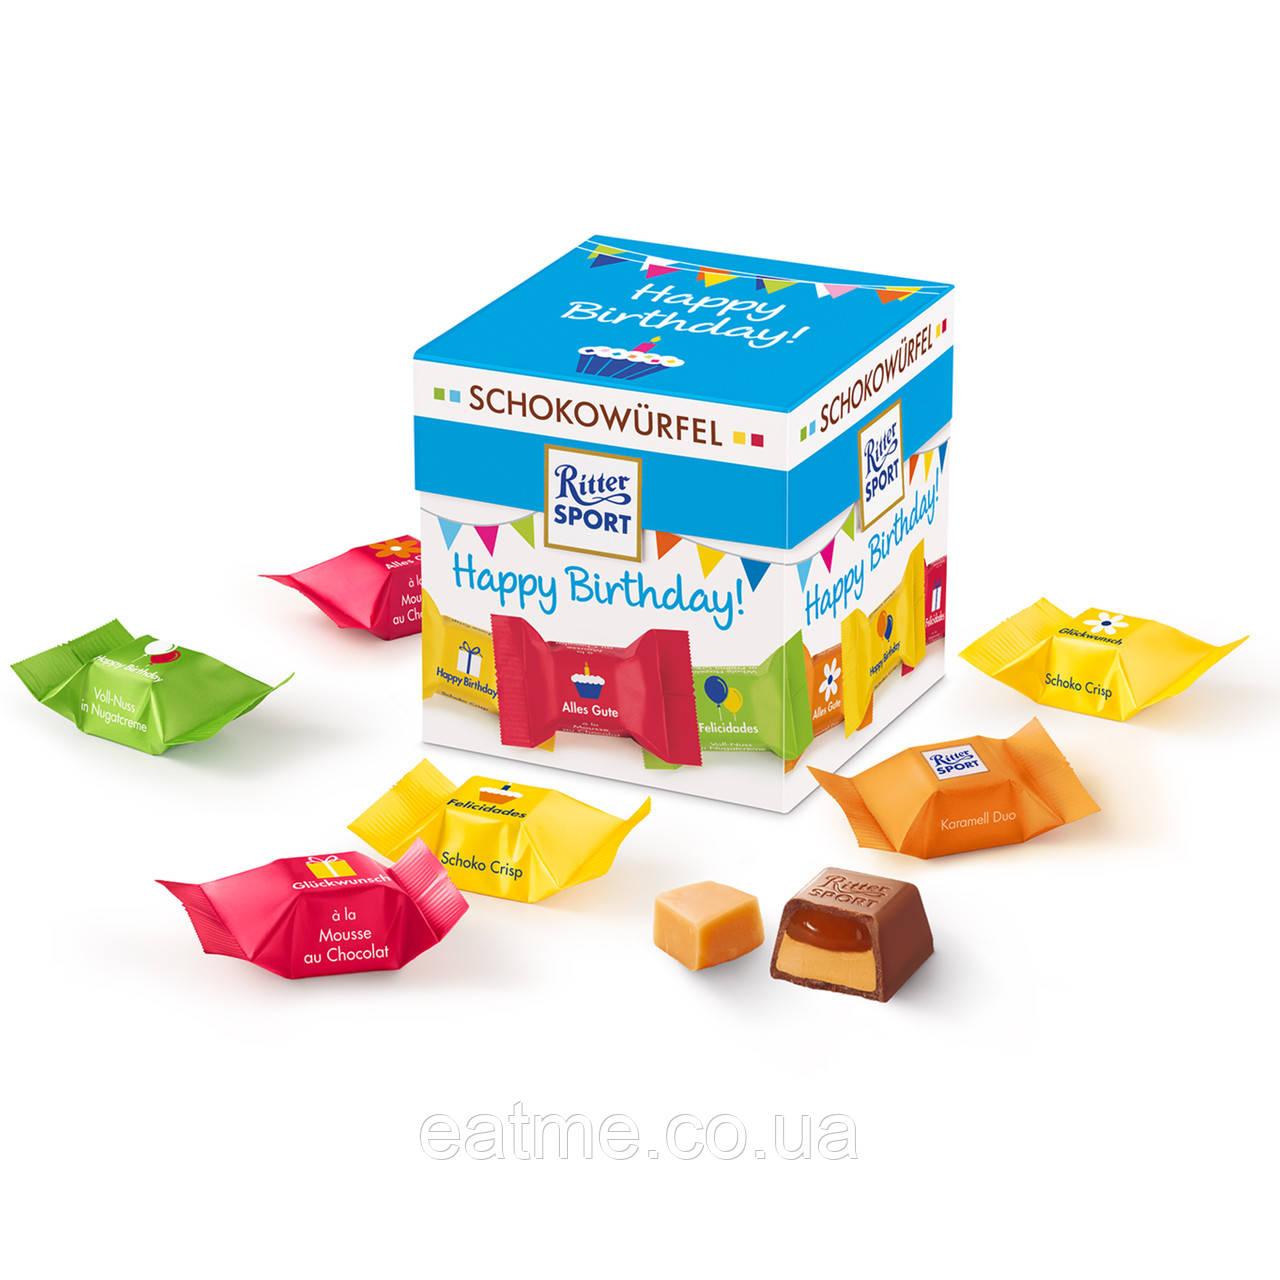 Ritter Sport box Happy Birthday  Подарочная коробочка конфет «С Днём Рождения»